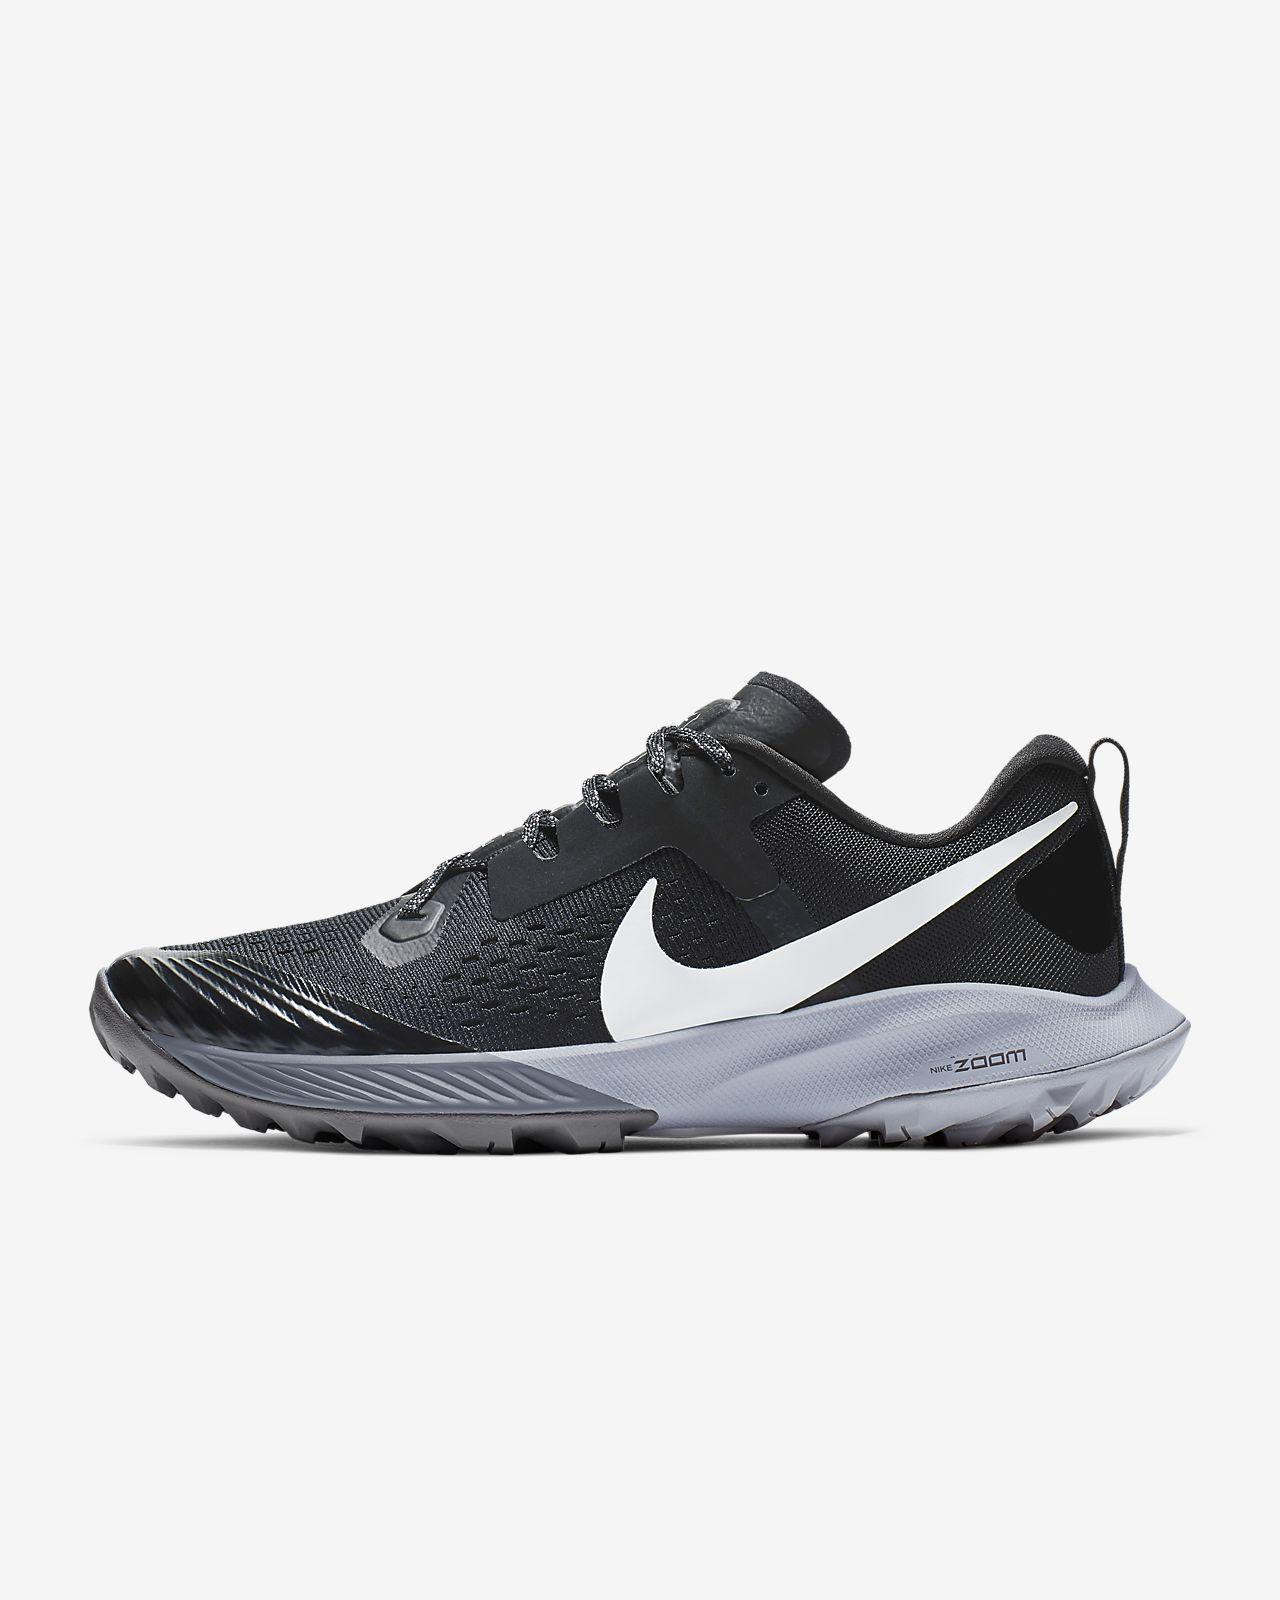 189 Best nike shoes images | Nike shoes, Nike women, Nike